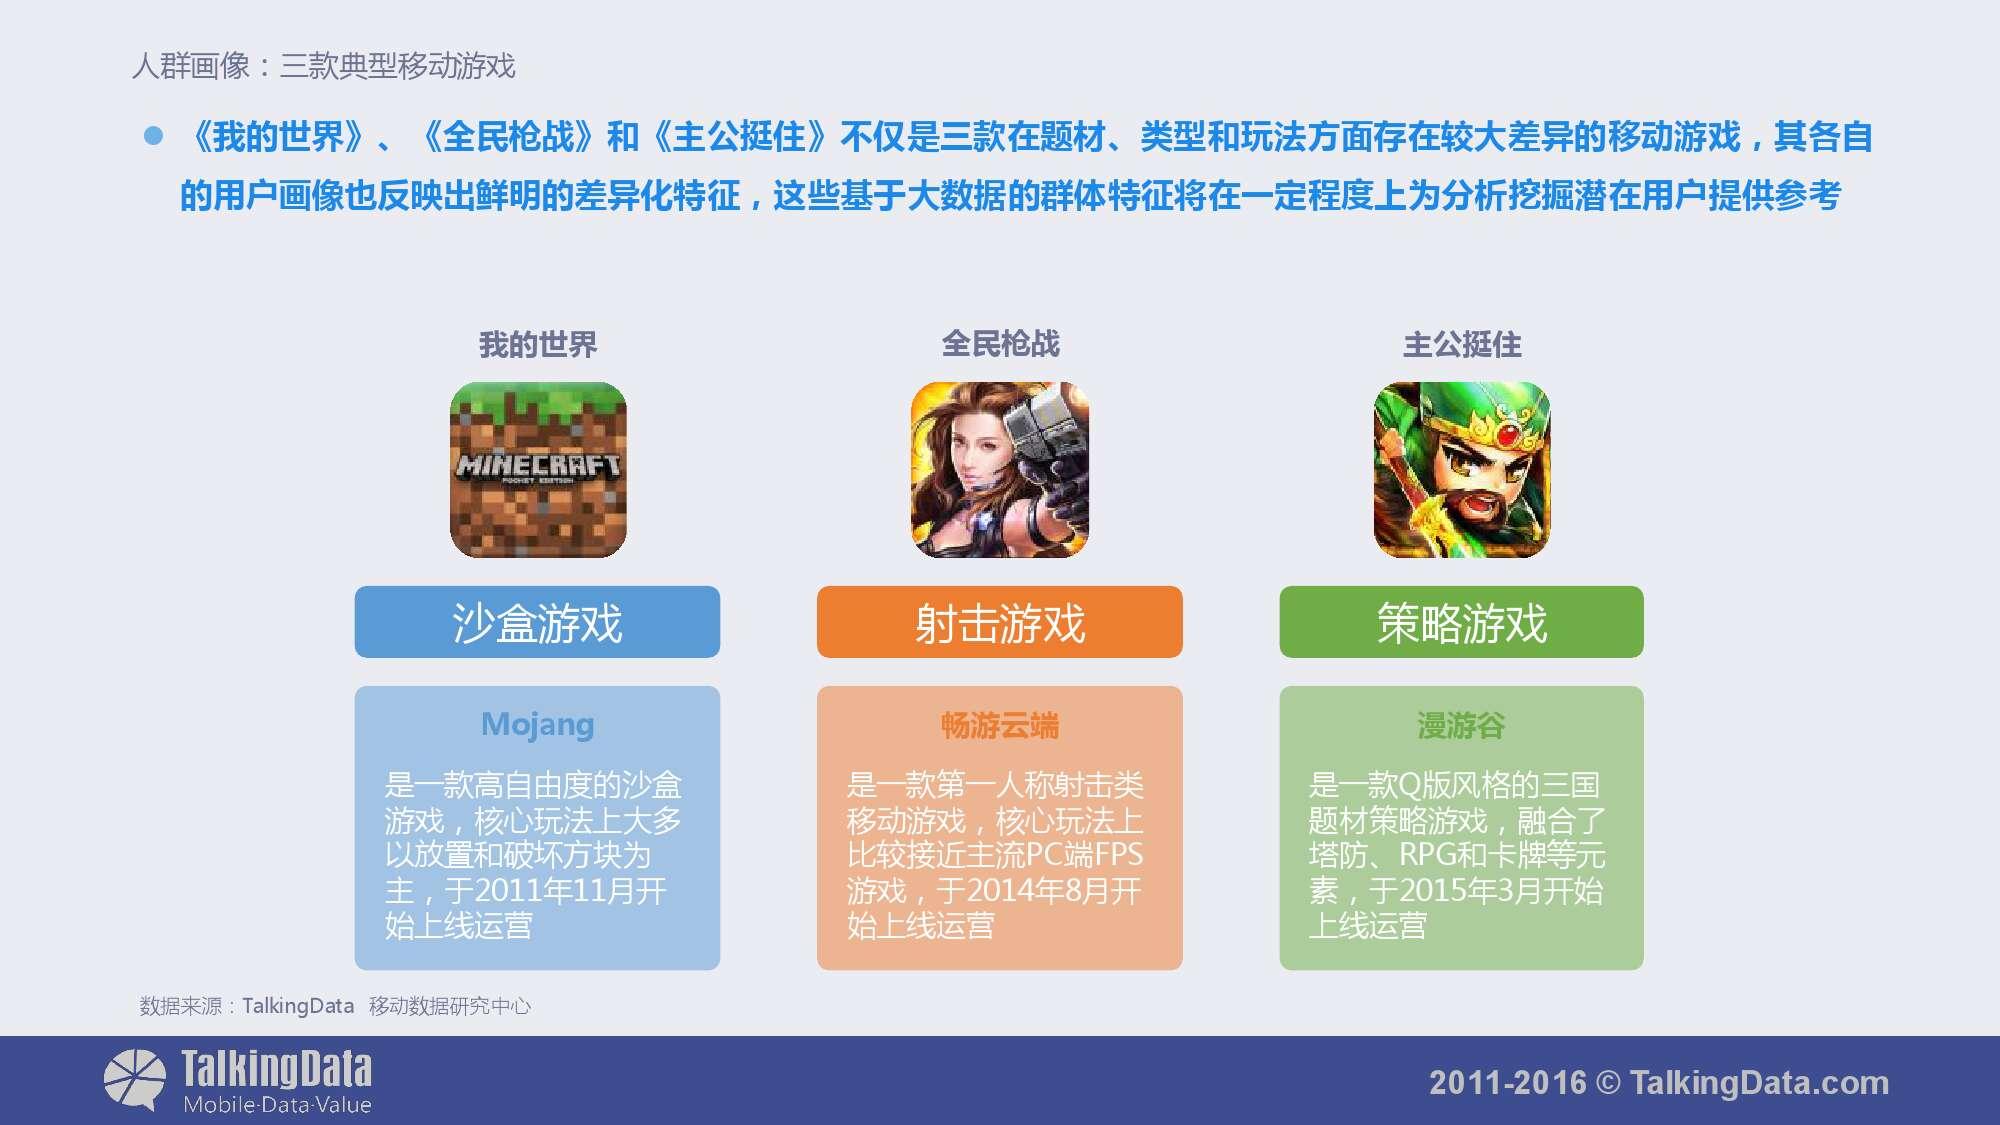 TalkingData-2015年移动游戏行业报告_000019